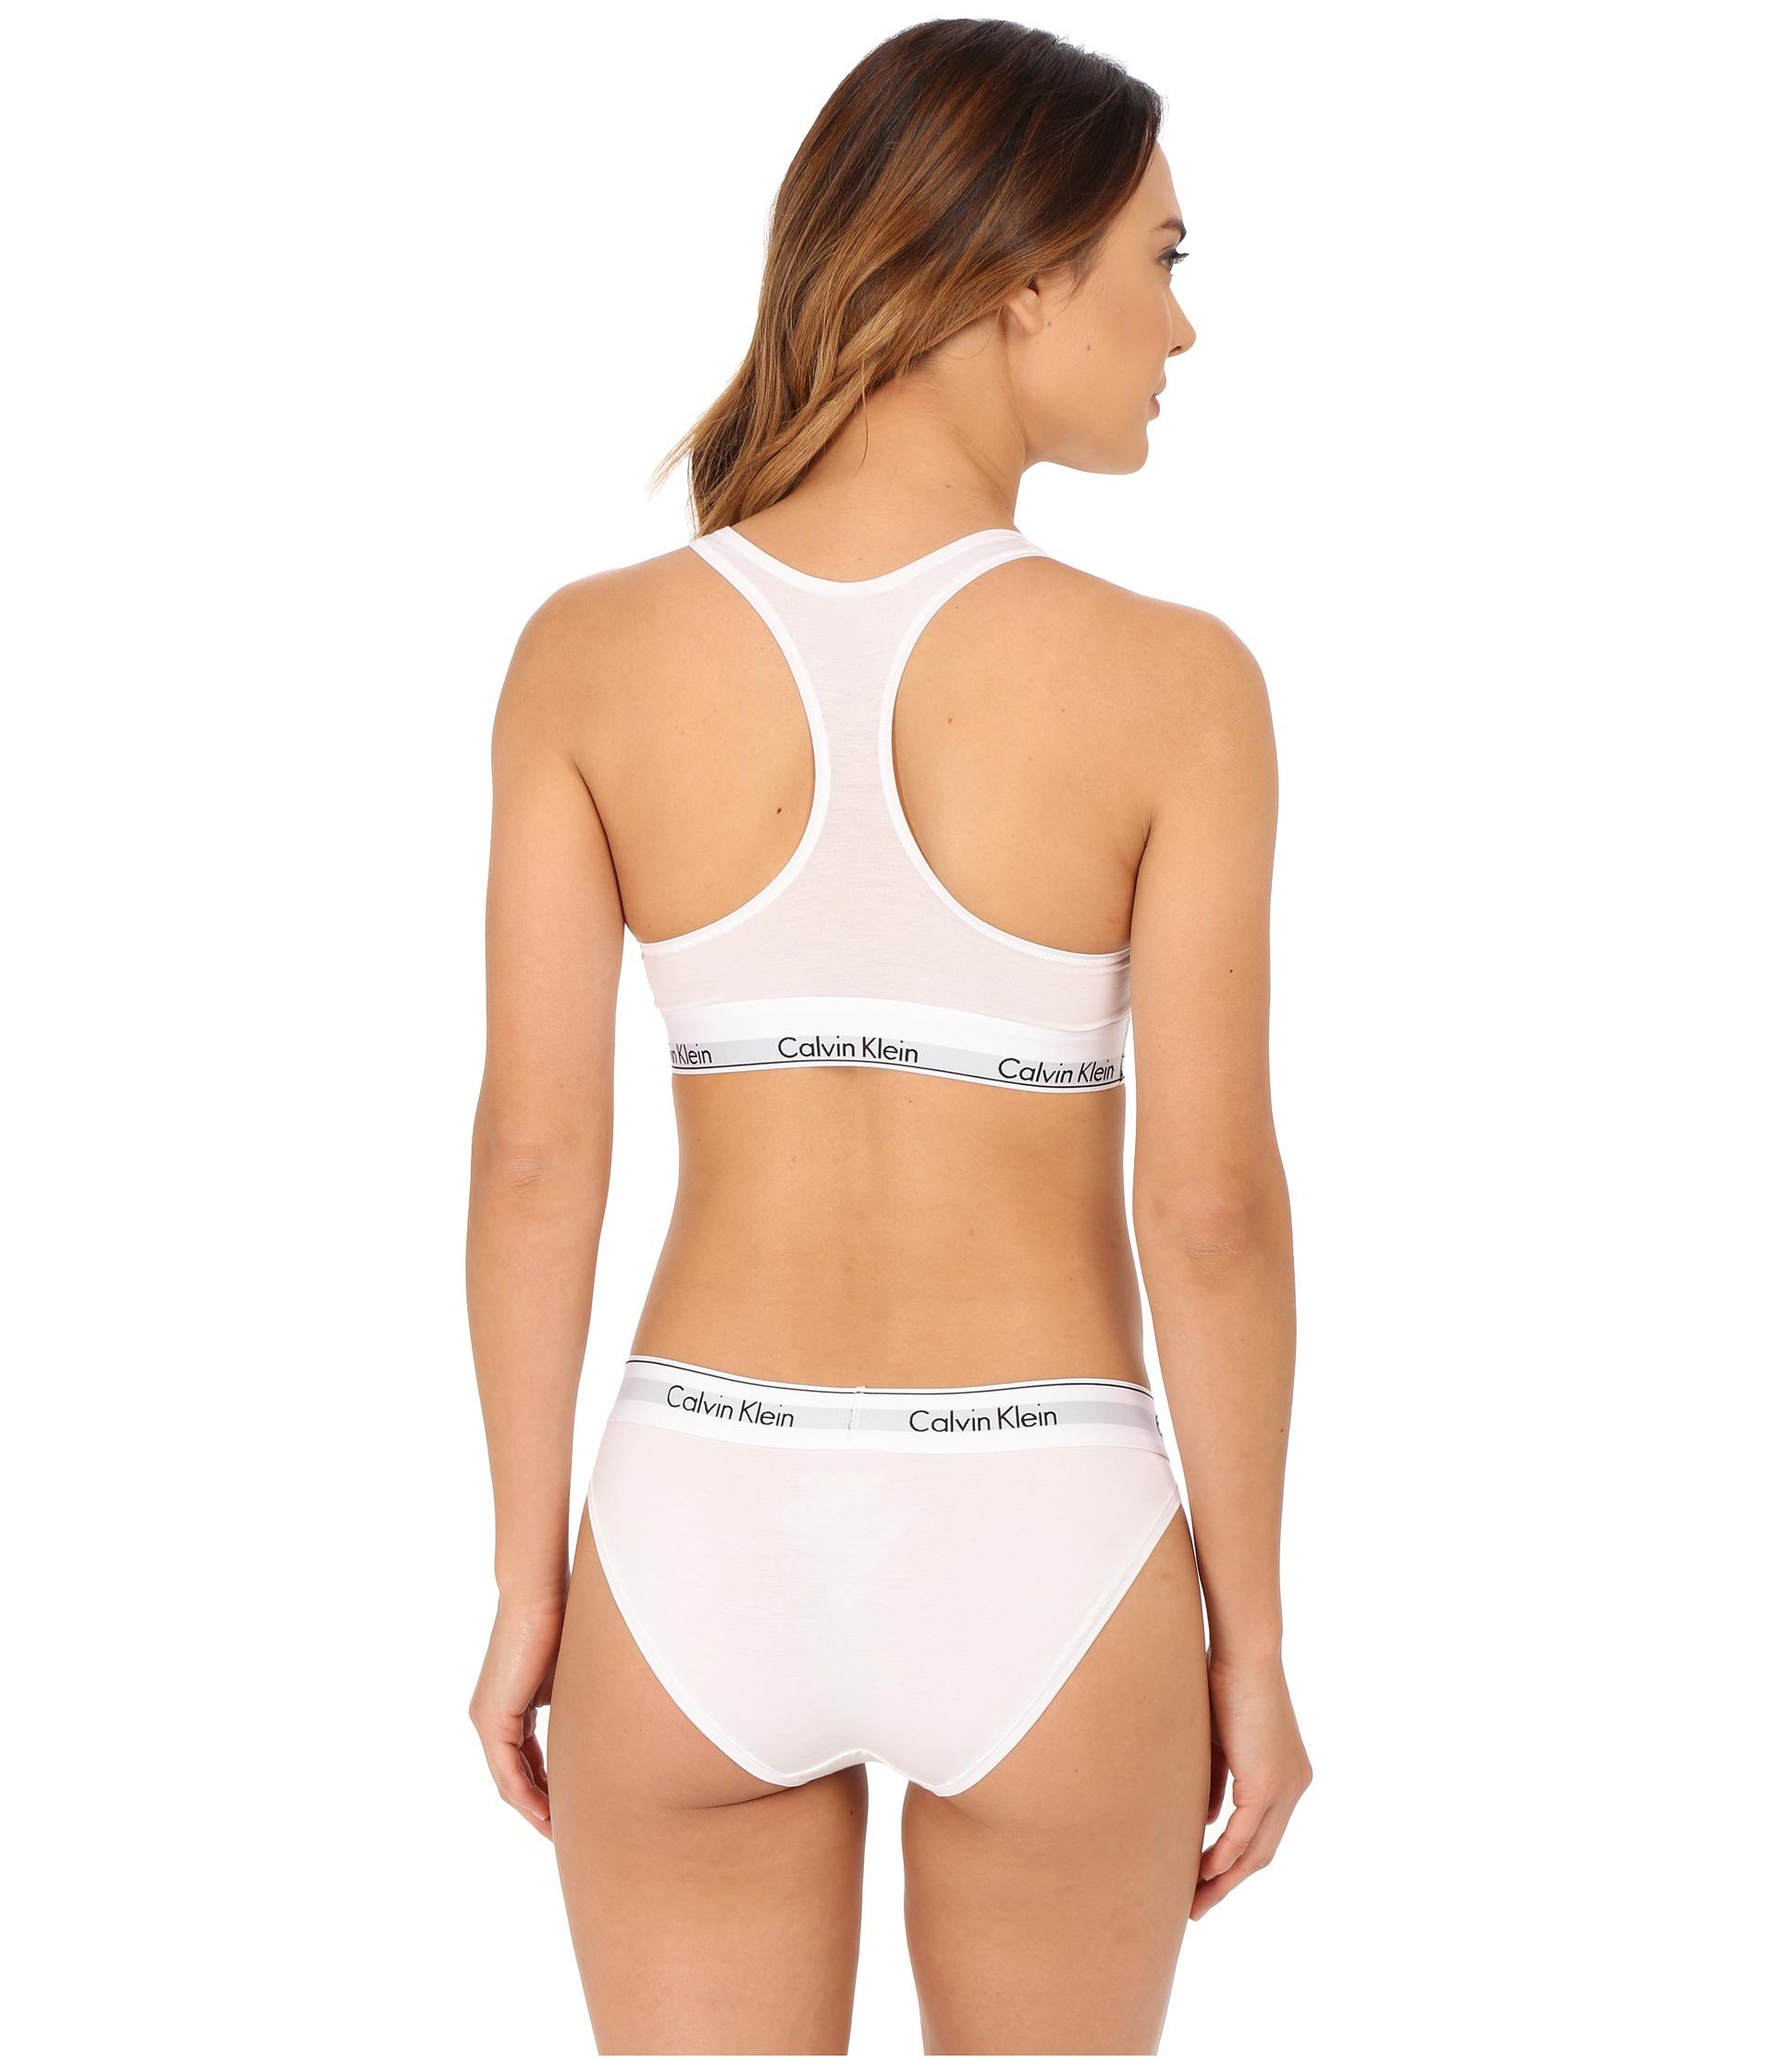 38f893be5561e Lyst - Calvin Klein Modern Cotton Gift Set in White